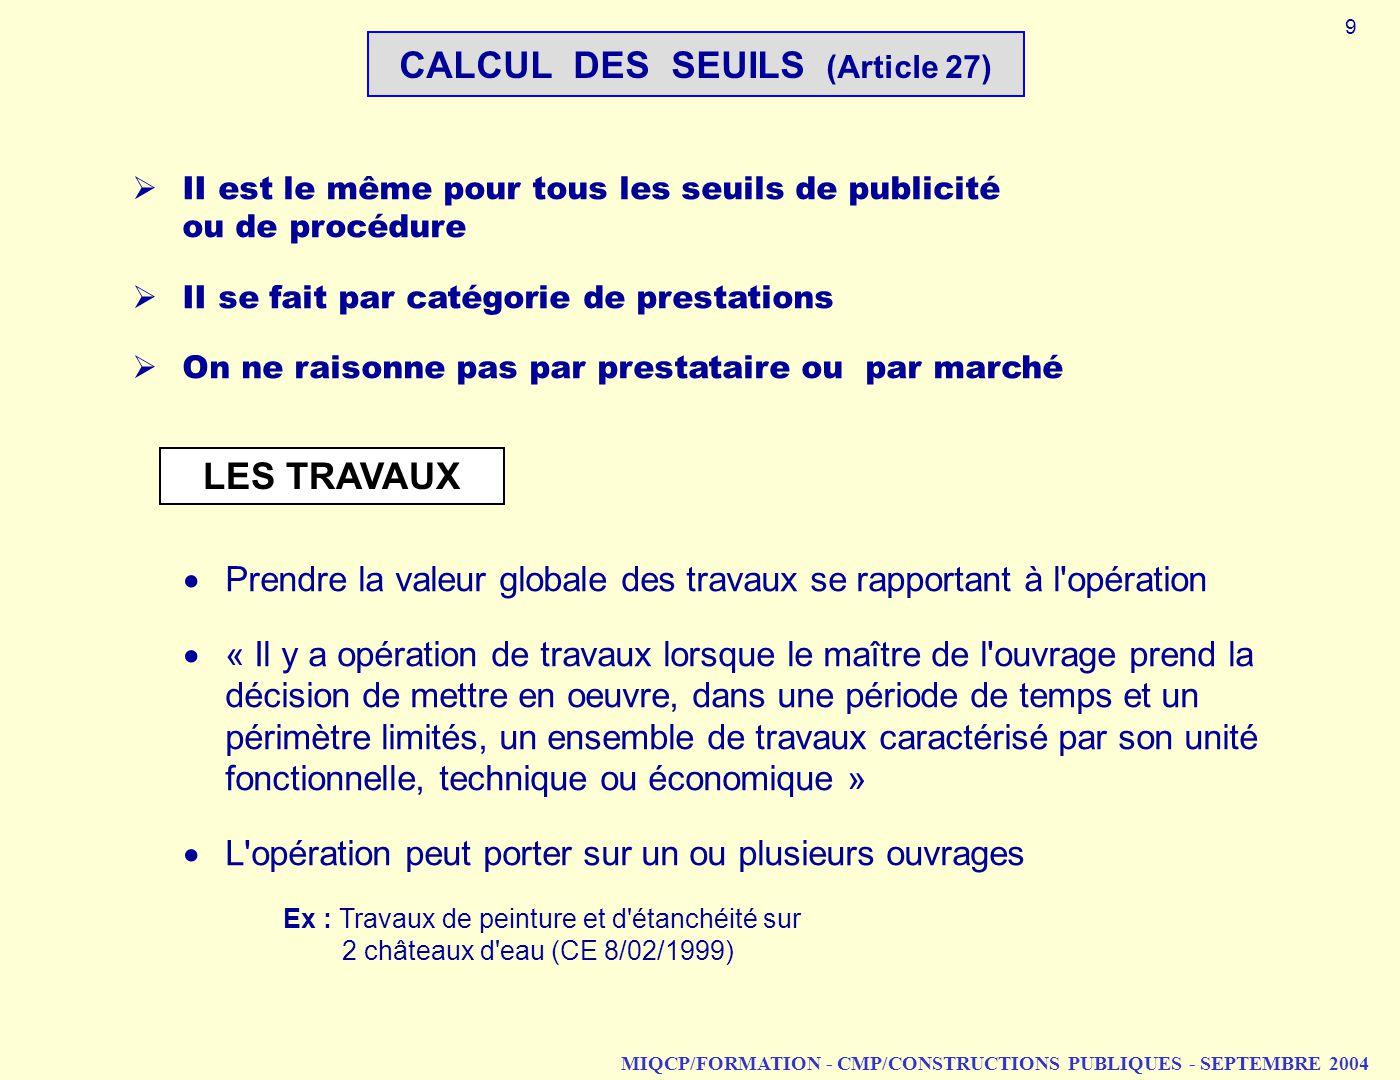 CALCUL DES SEUILS (Article 27)